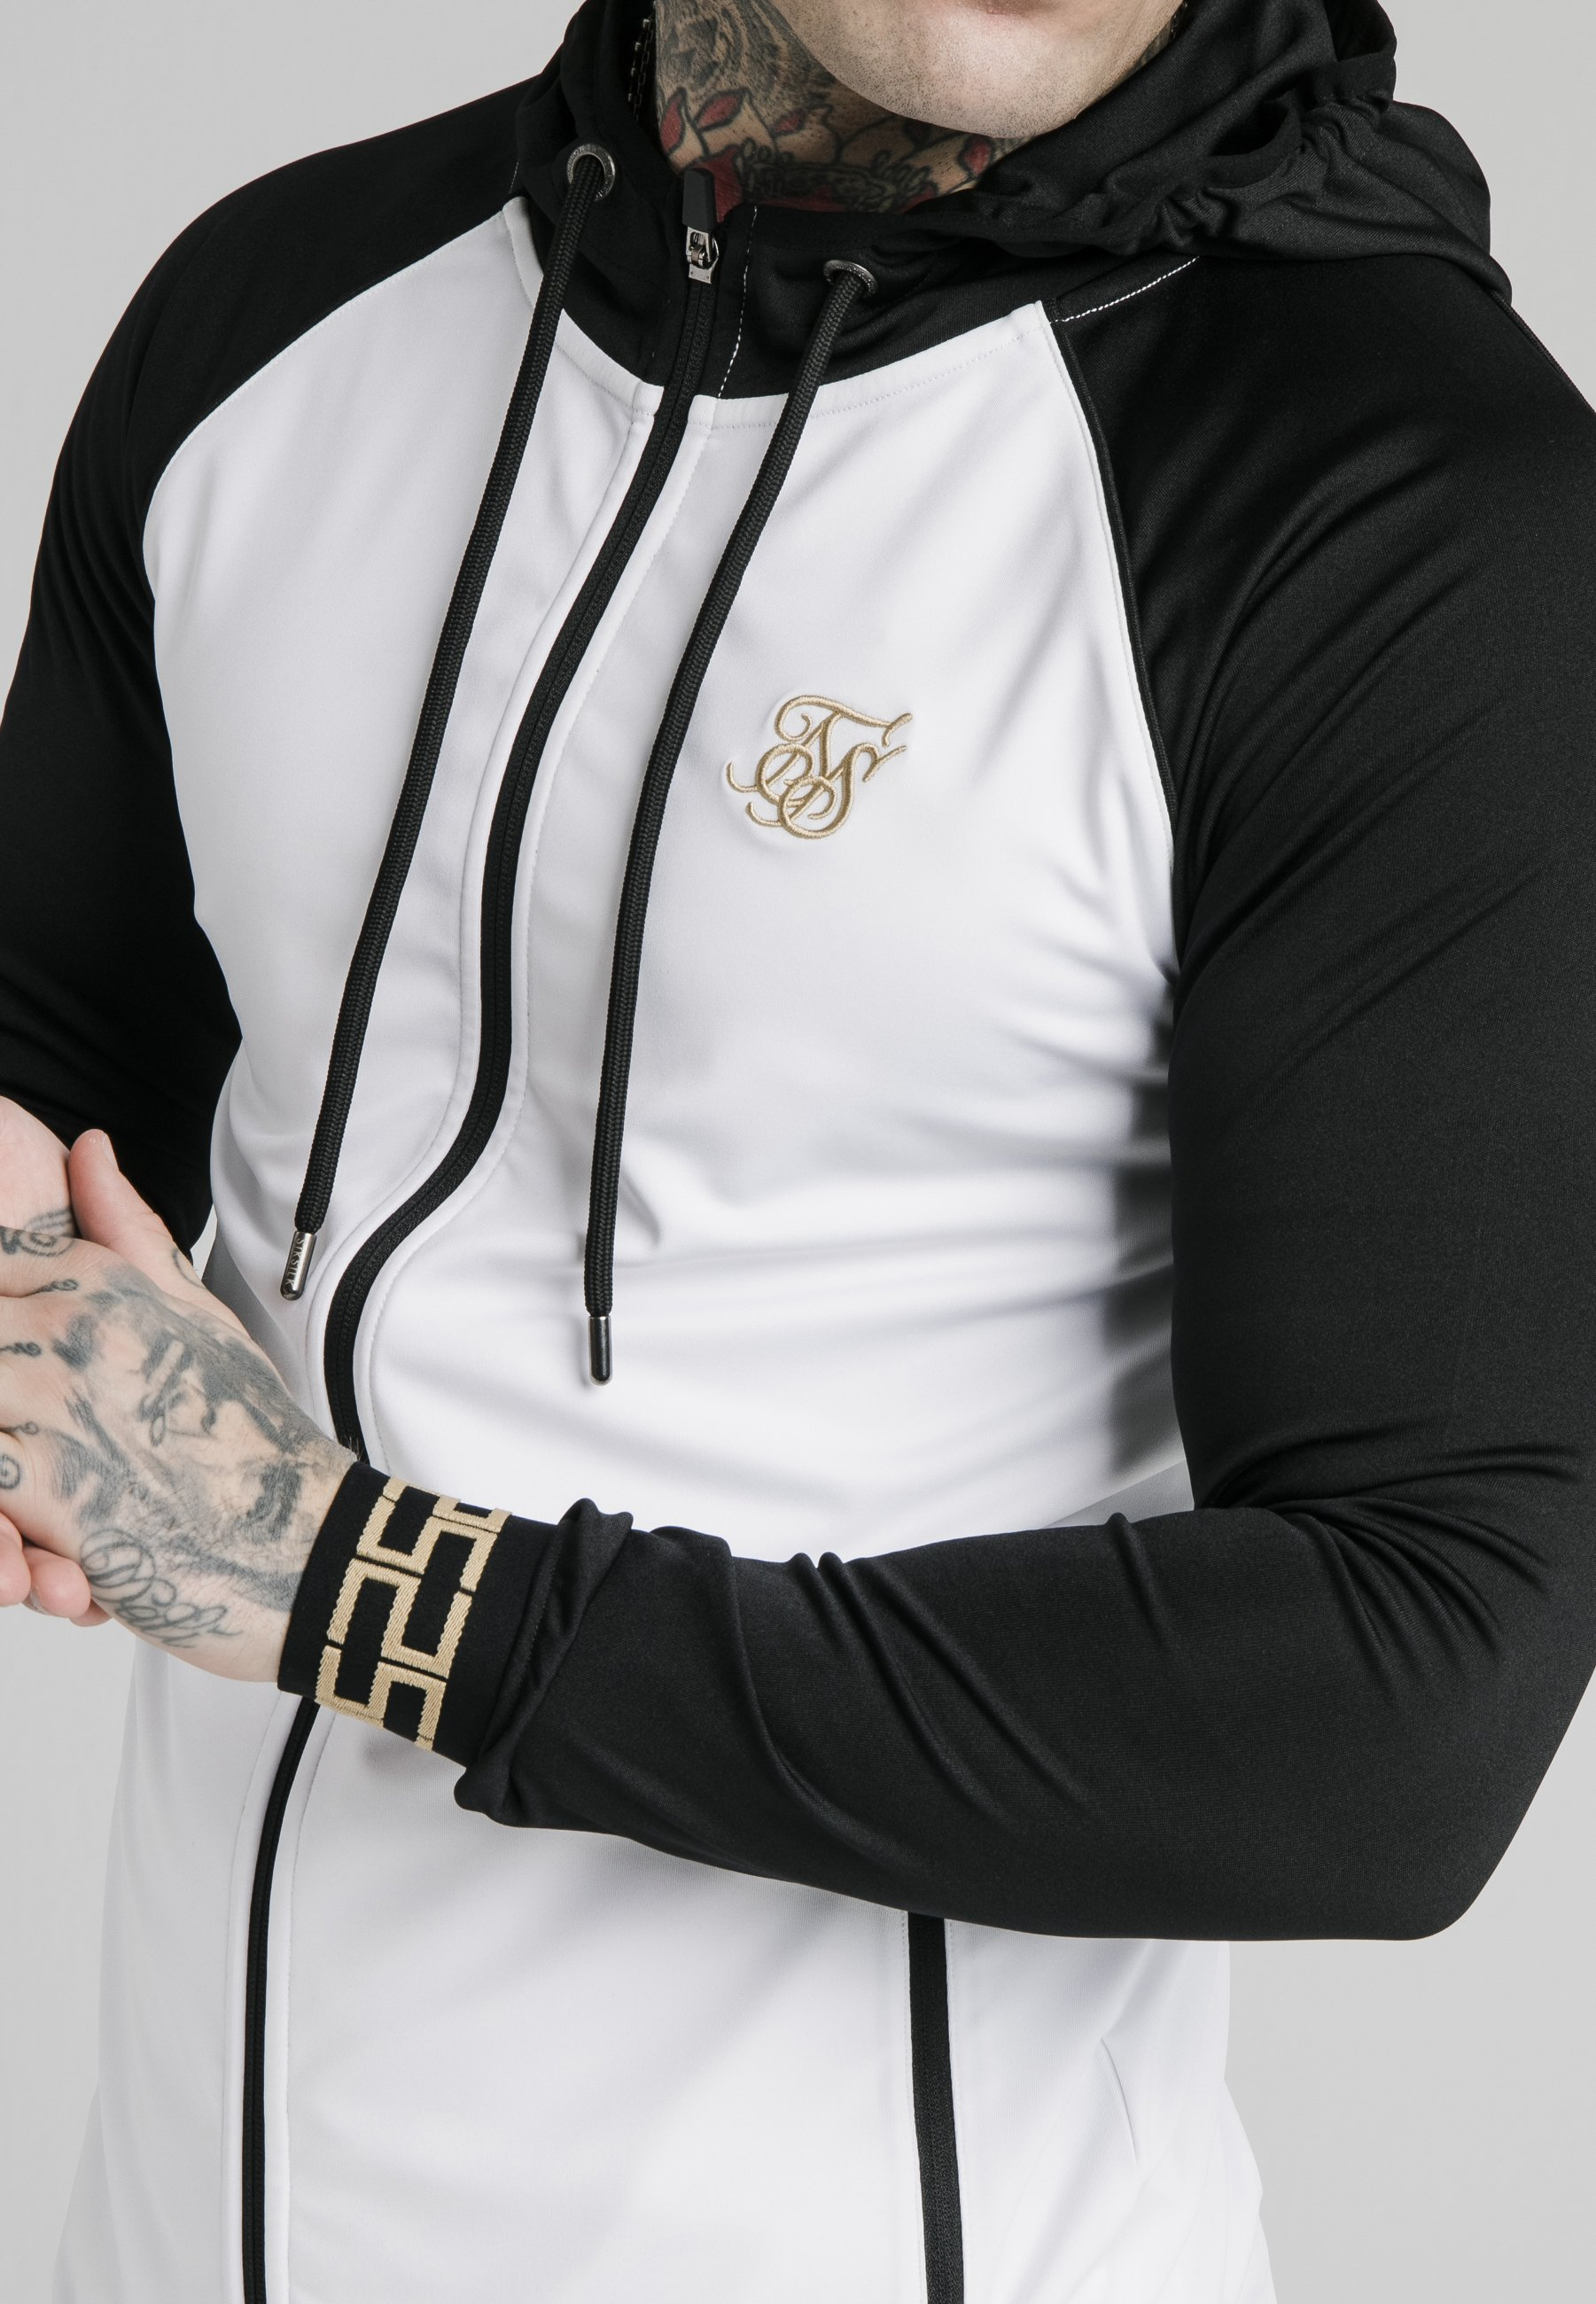 Limit Offer Cheap New Lower Prices Men's Clothing SIKSILK SCOPE ZIP CONTRAST THROUGH HOODIE Cardigan black/white u1A8zZTCQ GOgwiSb0p